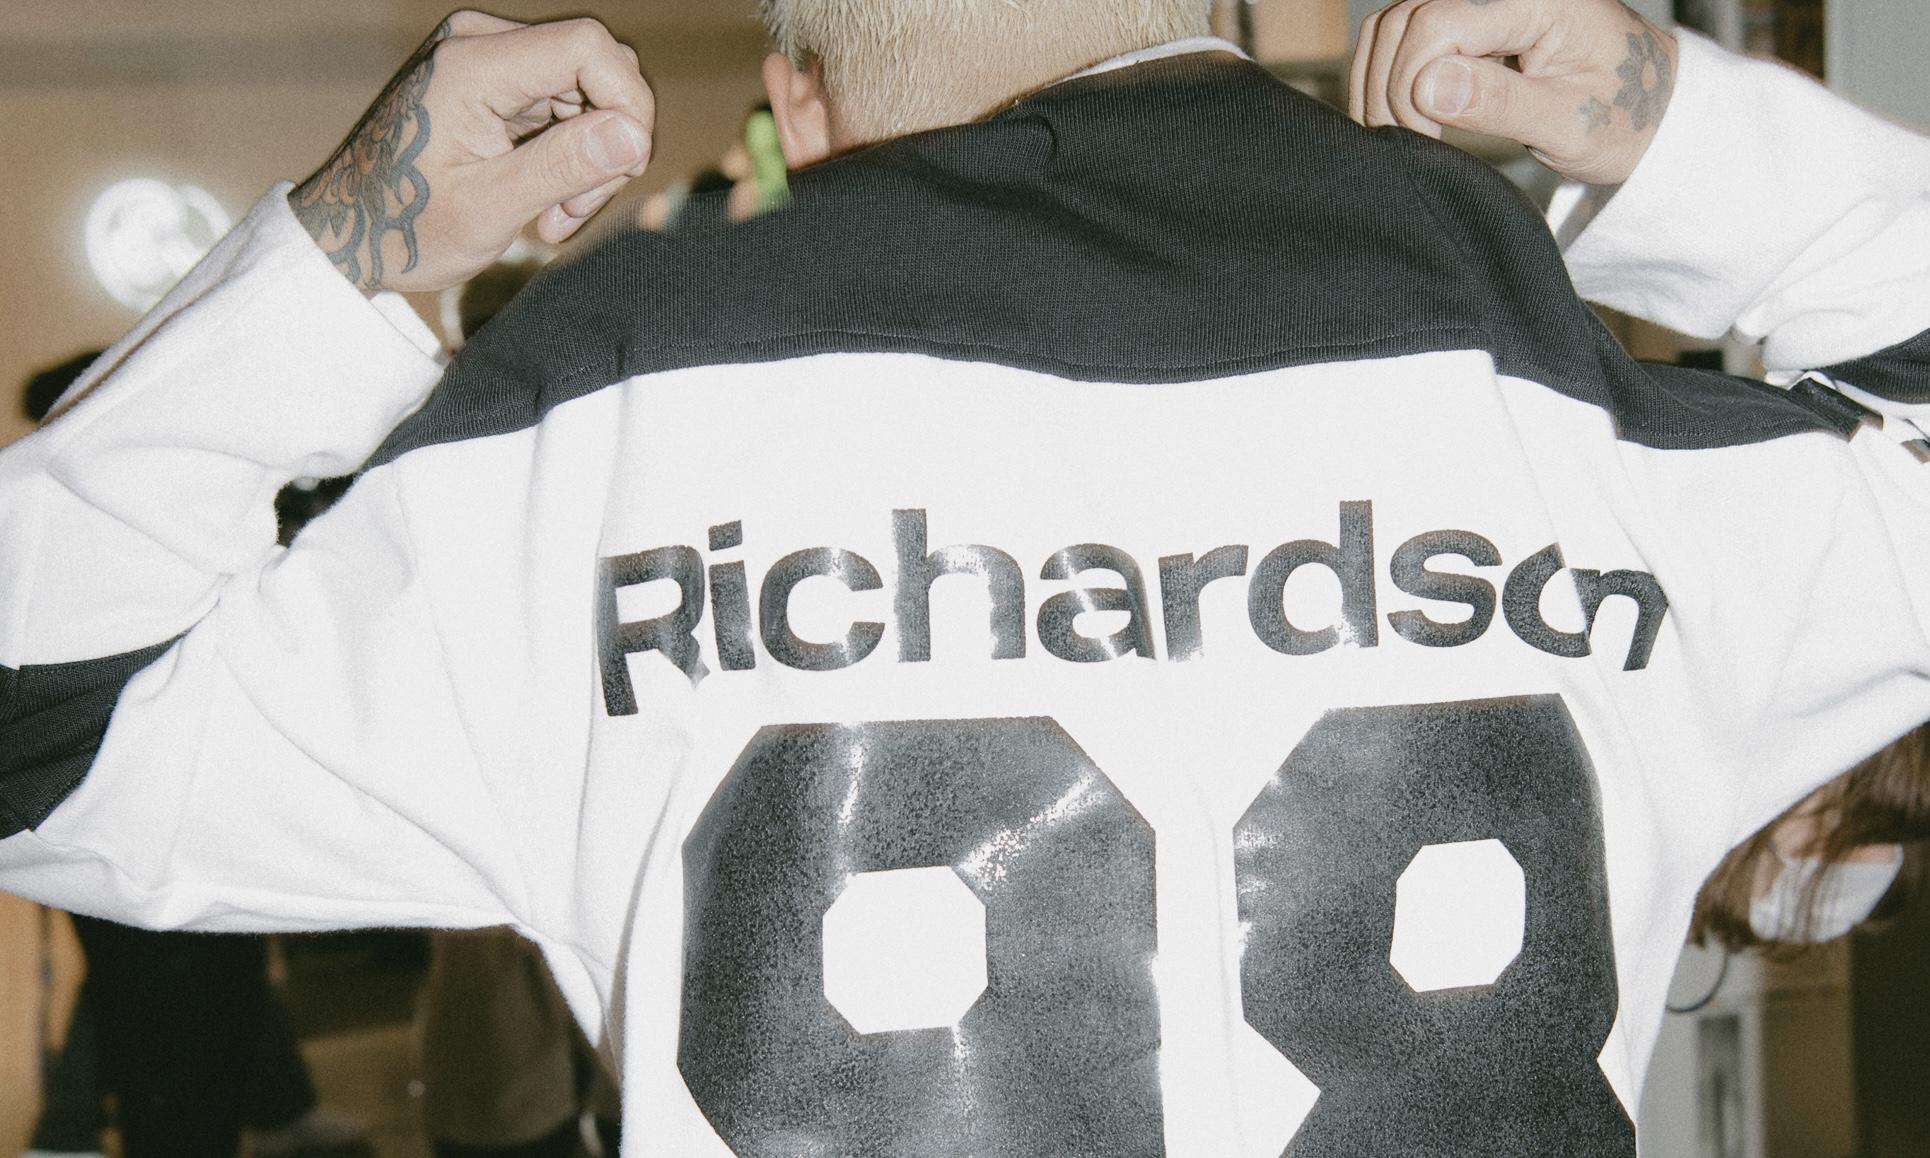 Richardson新コレクション発売 3都市限定品も